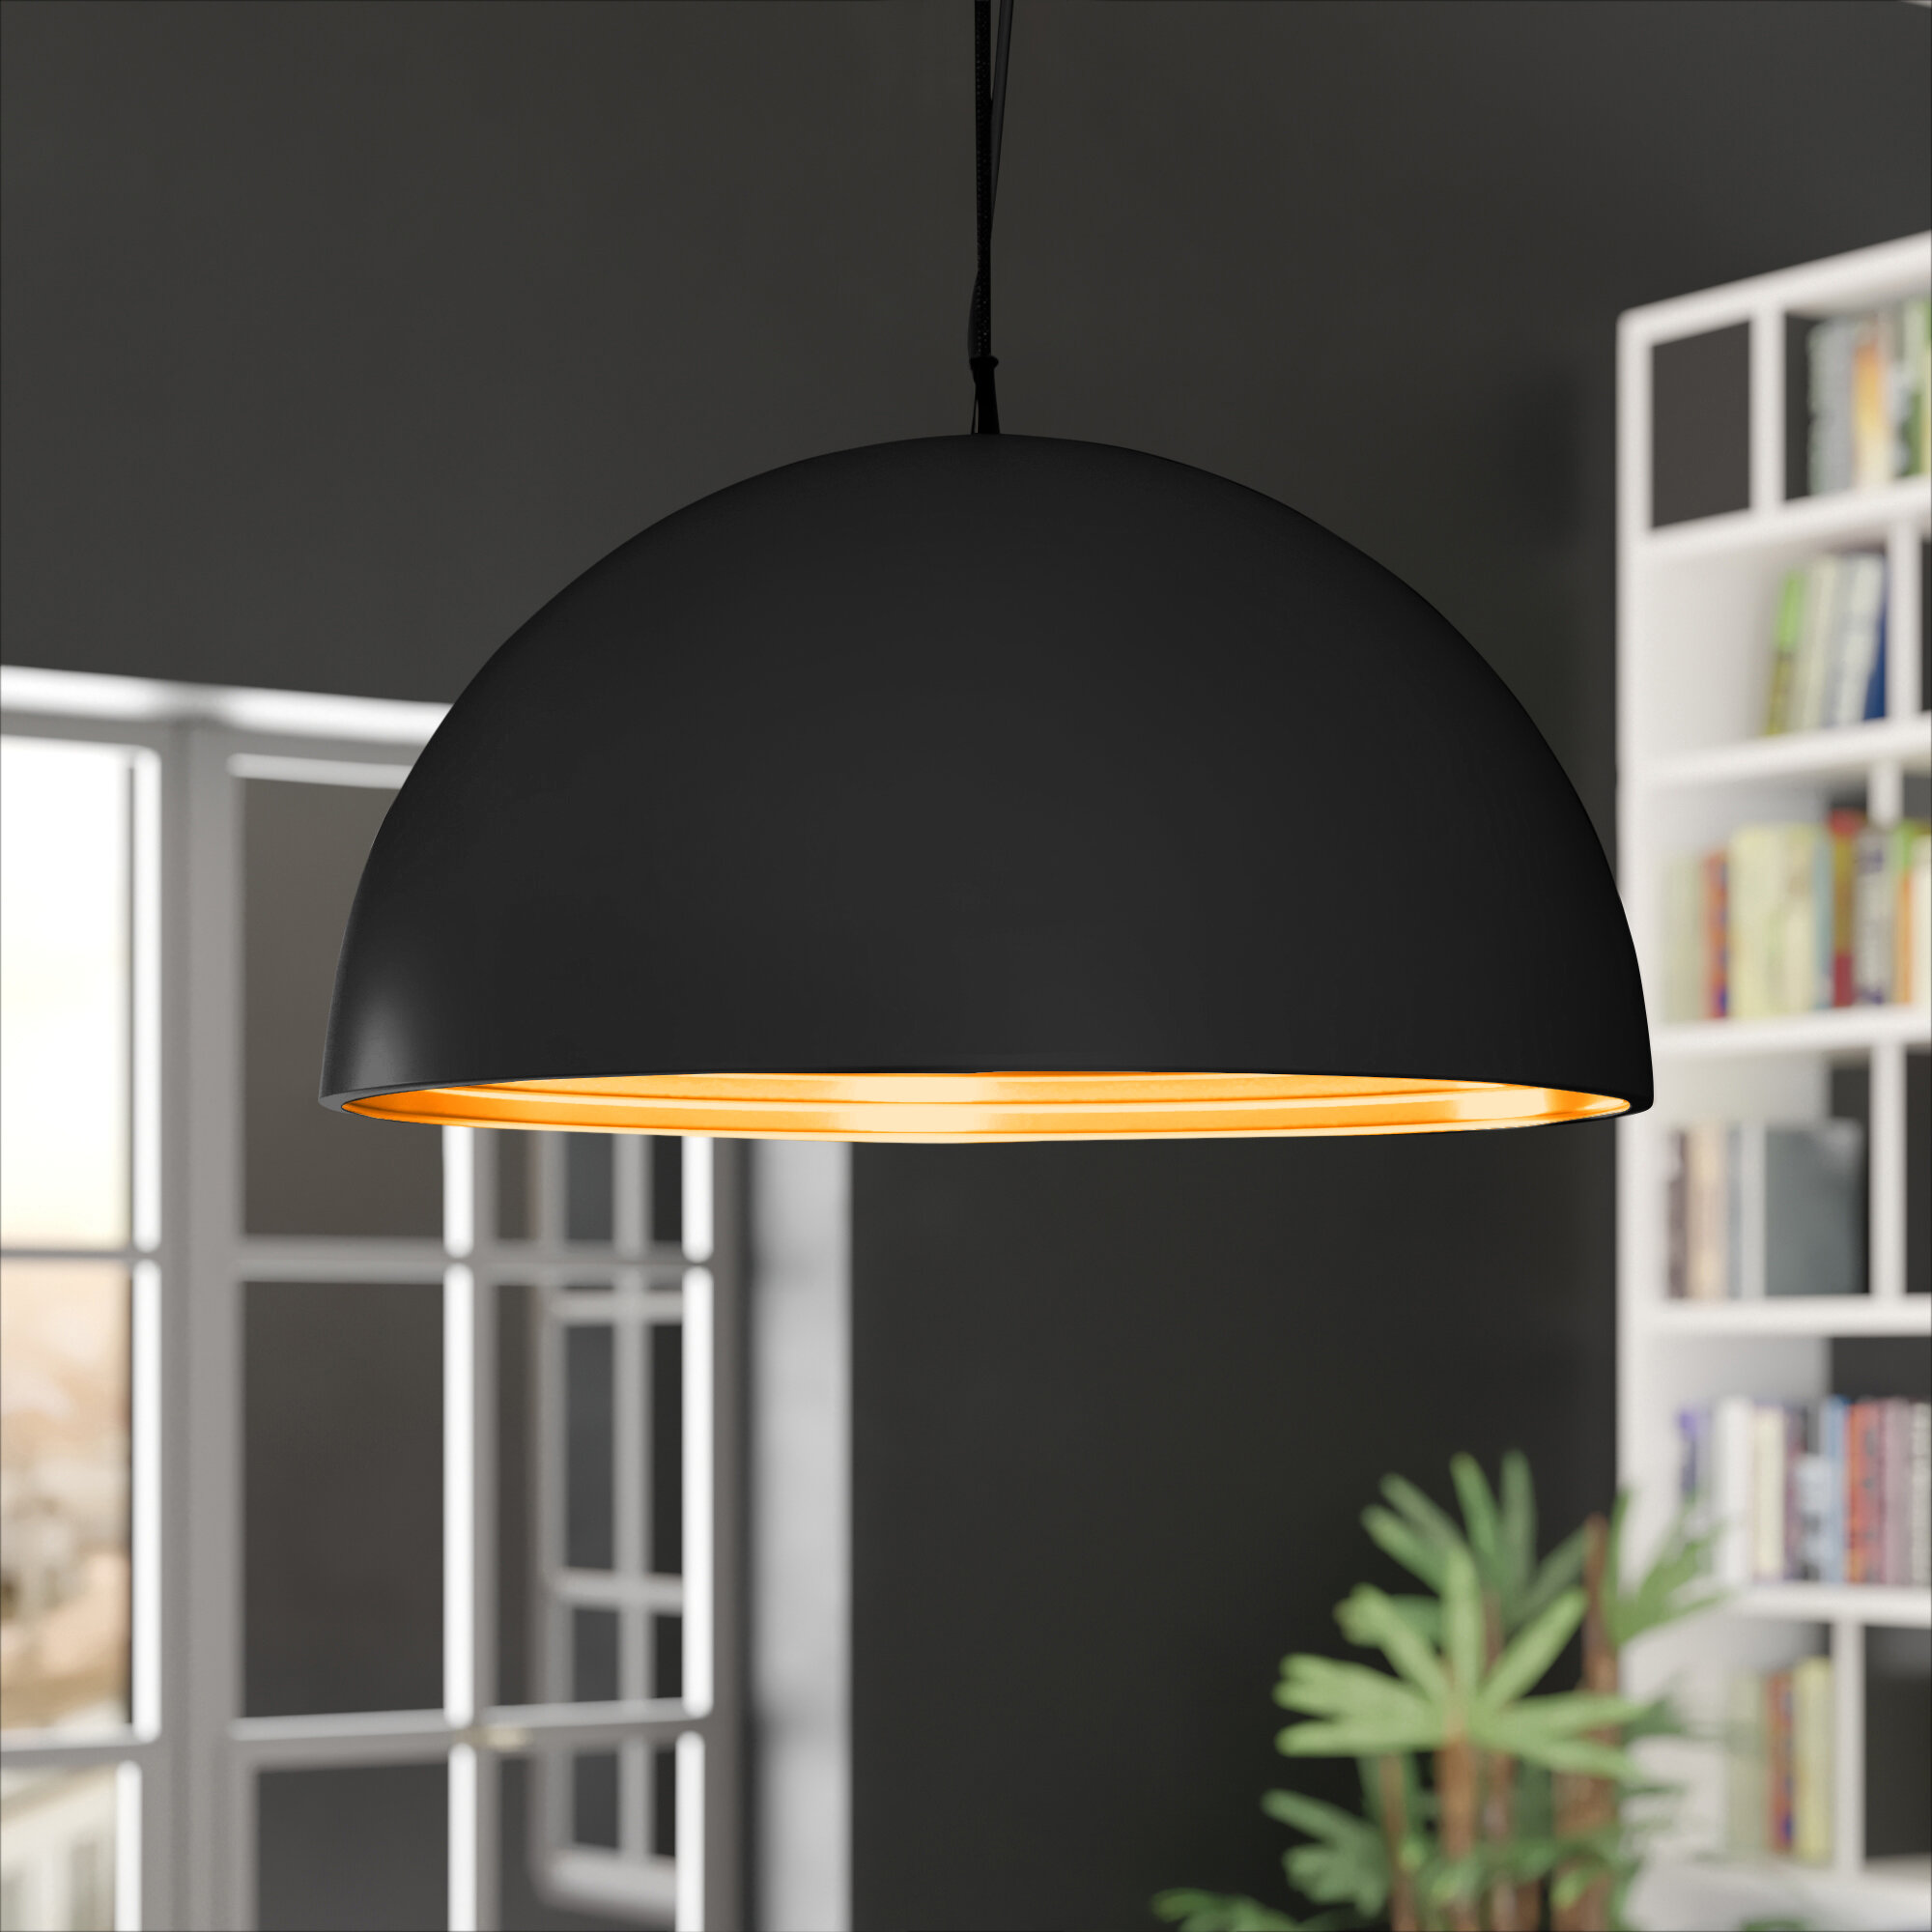 Image of: Mid Century Modern Pendant Lighting You Ll Love In 2020 Wayfair